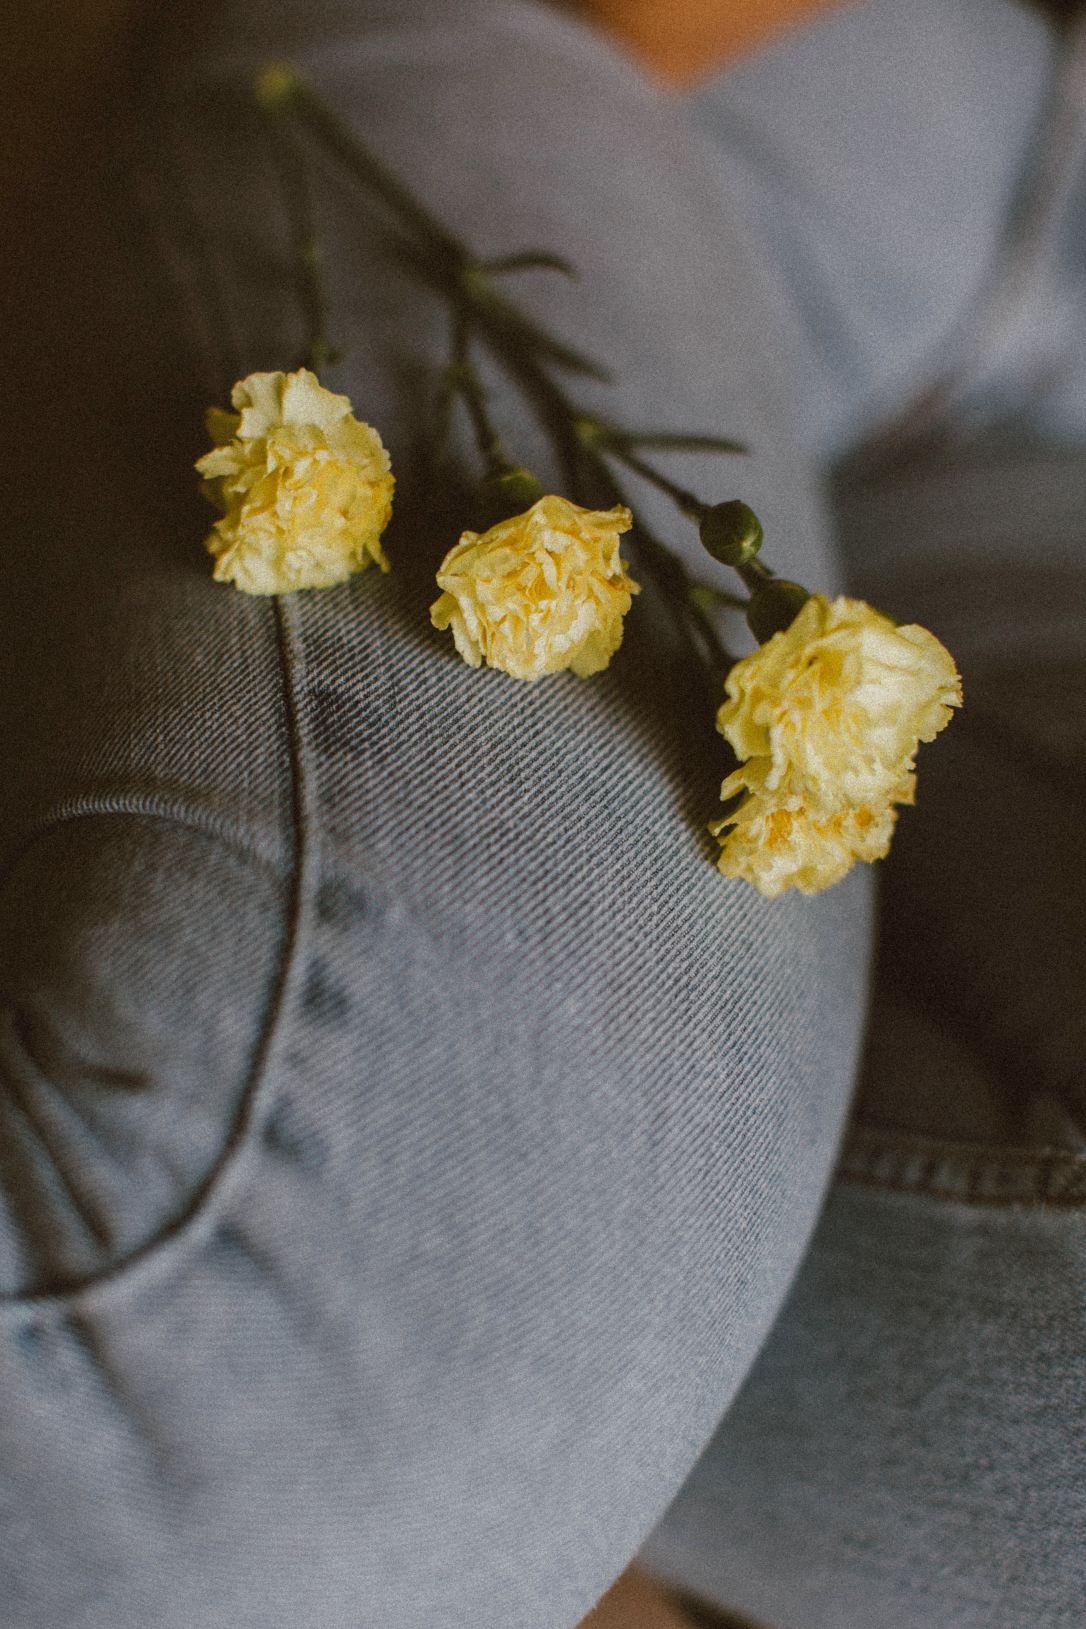 frank-flores-EWhD0Fp2_jY-unsplash